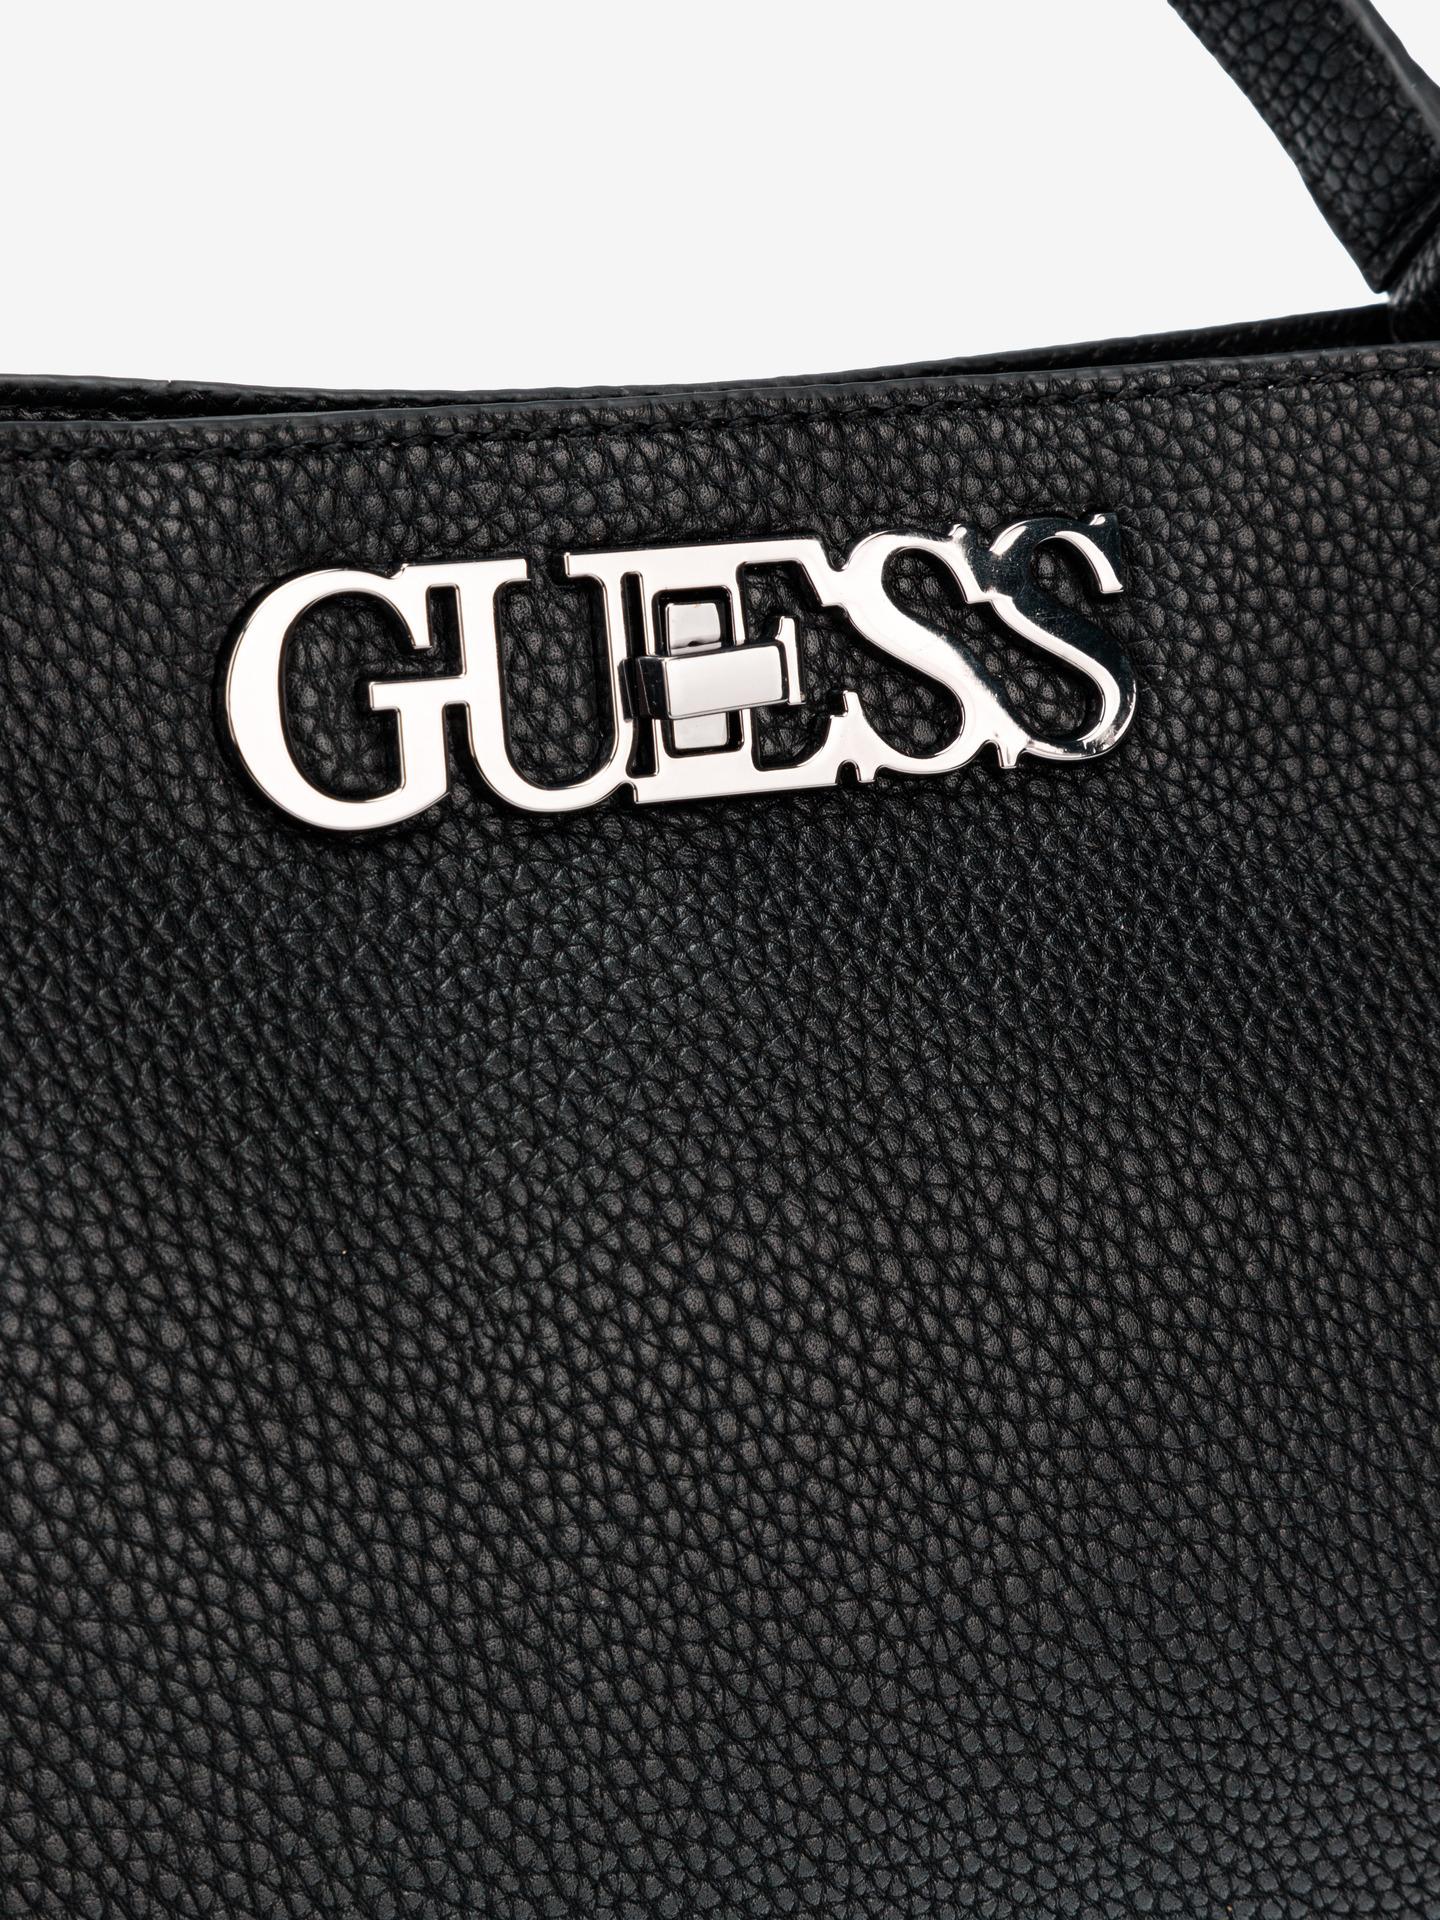 Guess черна дамска чанта Uptown Chic Large